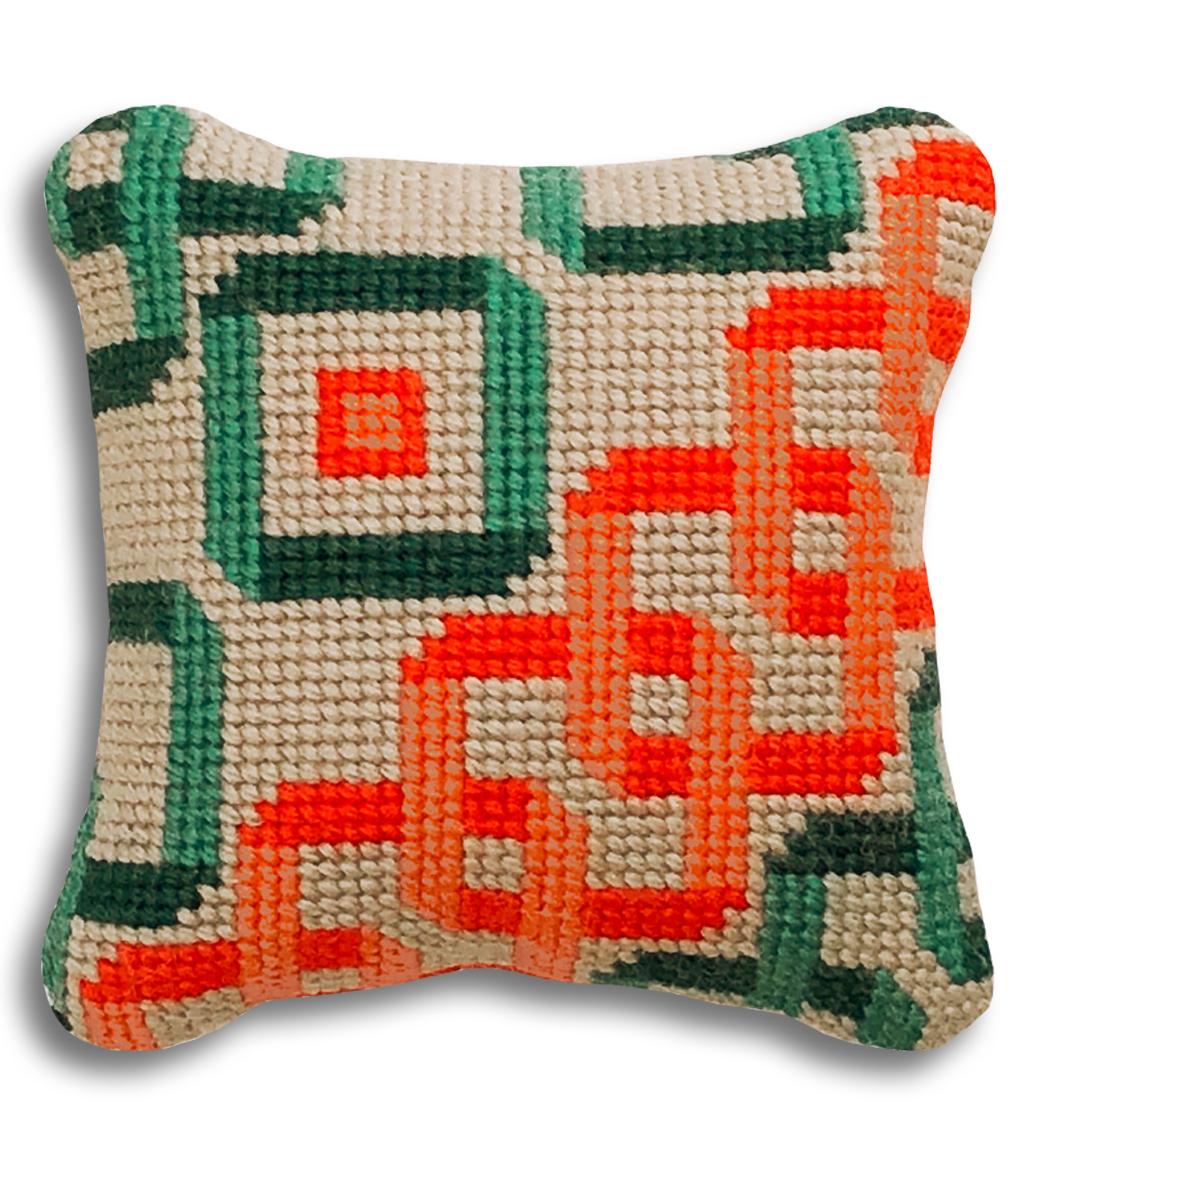 NEW! Interlocking Squares mini kit  Orange and turquoise colourway  £16  (includes free UK postage)